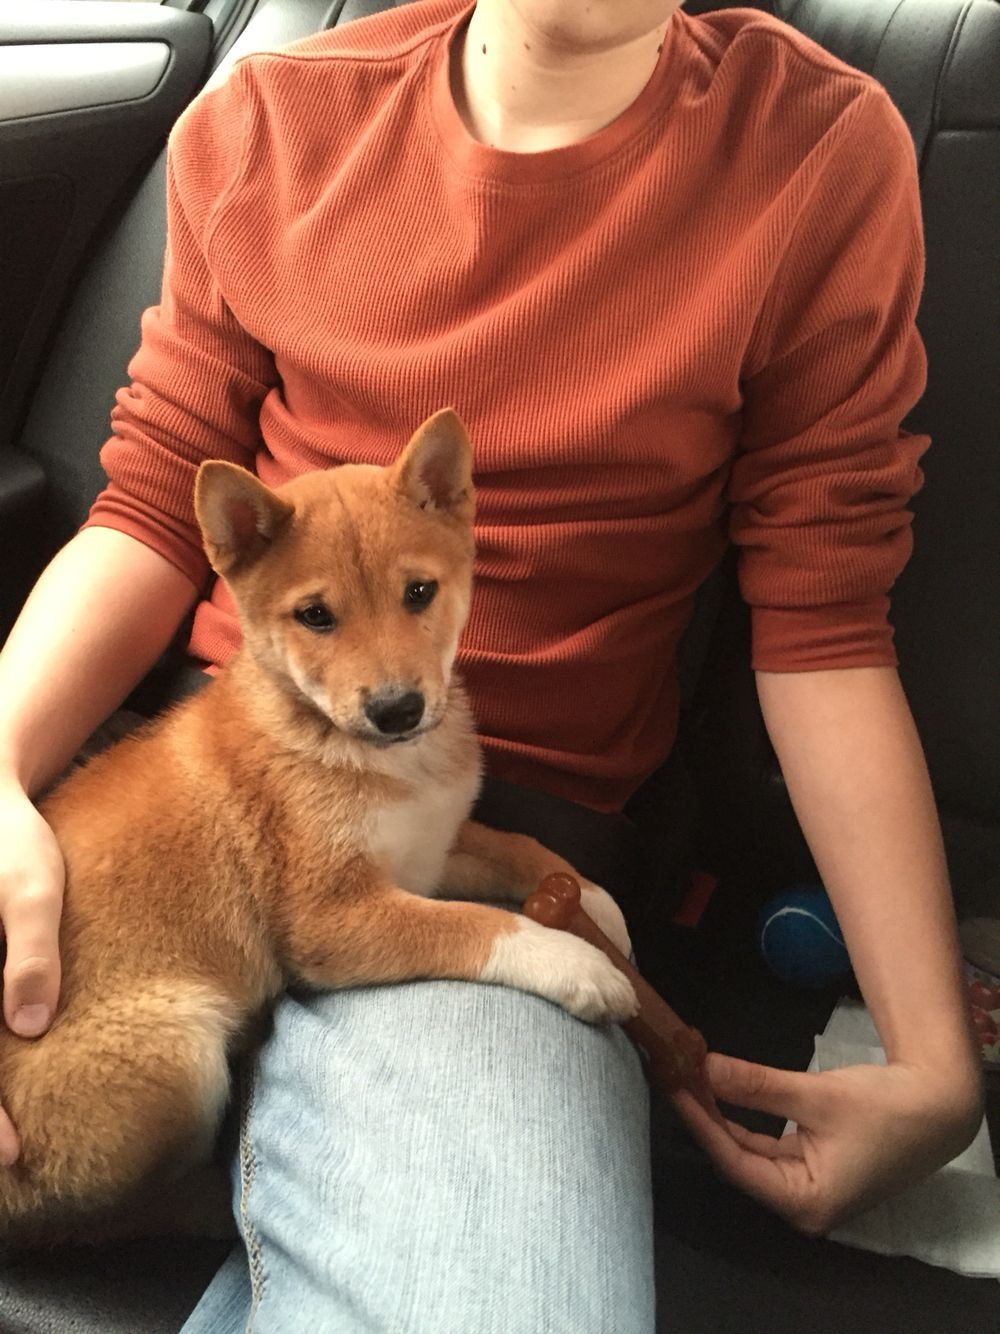 Shiba Inu pup, 3 months old | Shiba inu, Shiba inu puppy ...